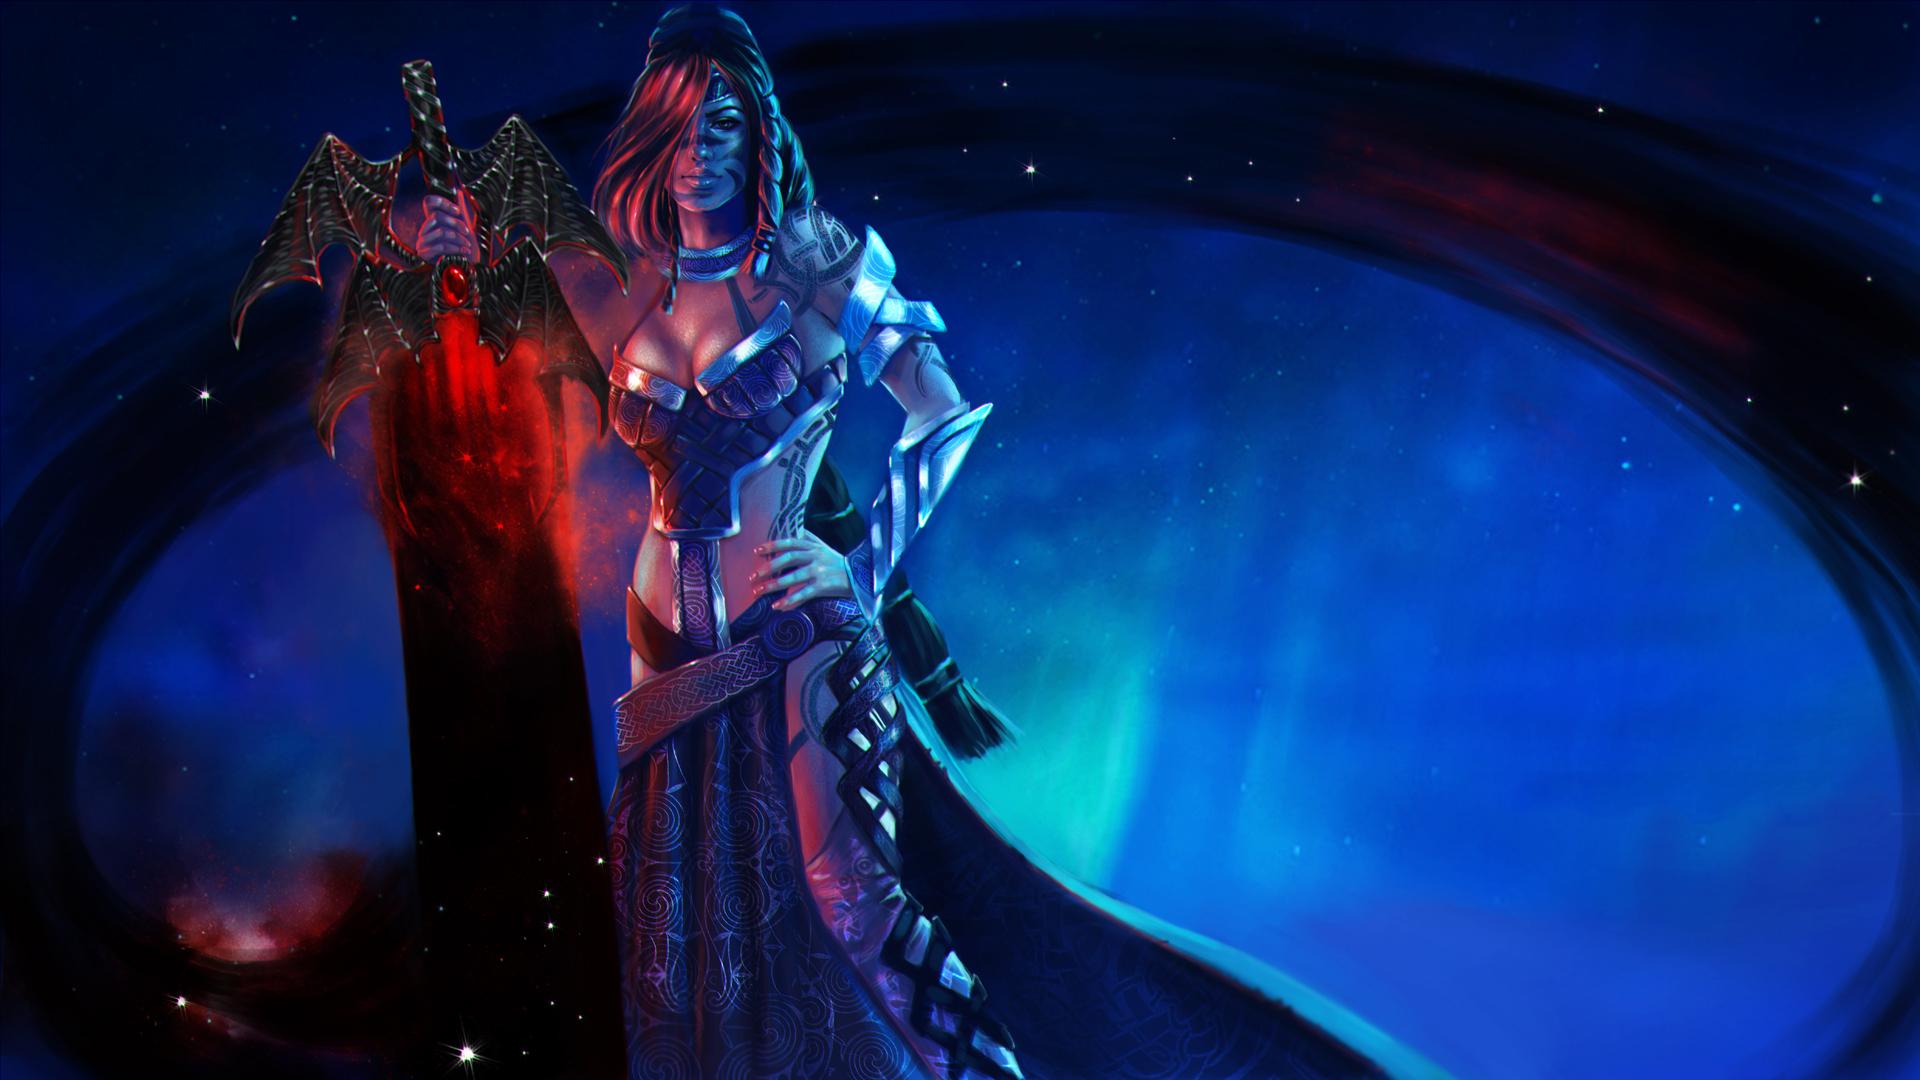 Guild Wars 2 HD Wallpaper   Background Image   1920x1080 ...